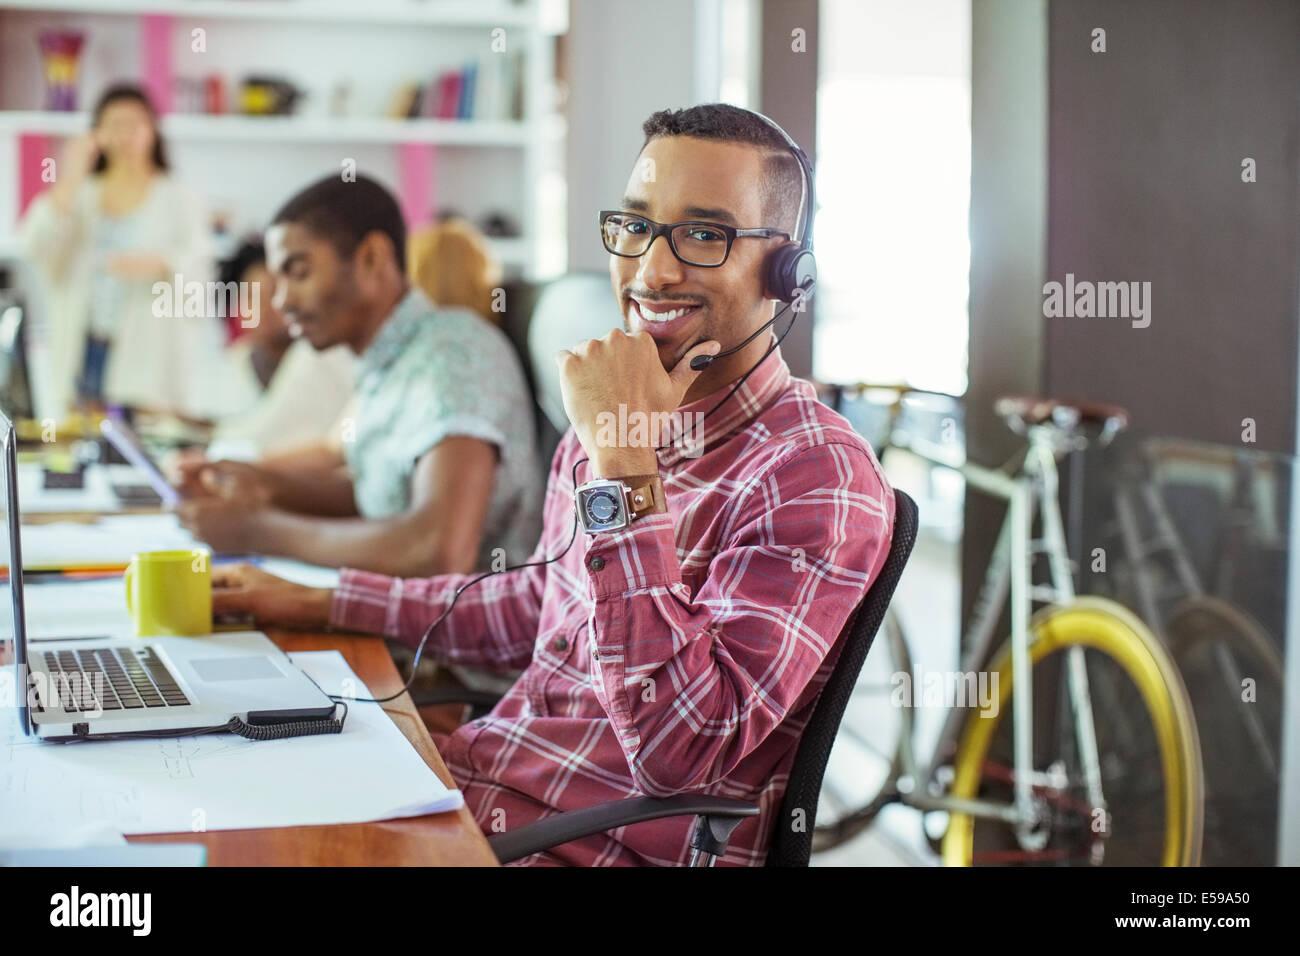 Mann lächelnd am Schreibtisch im Büro Stockbild